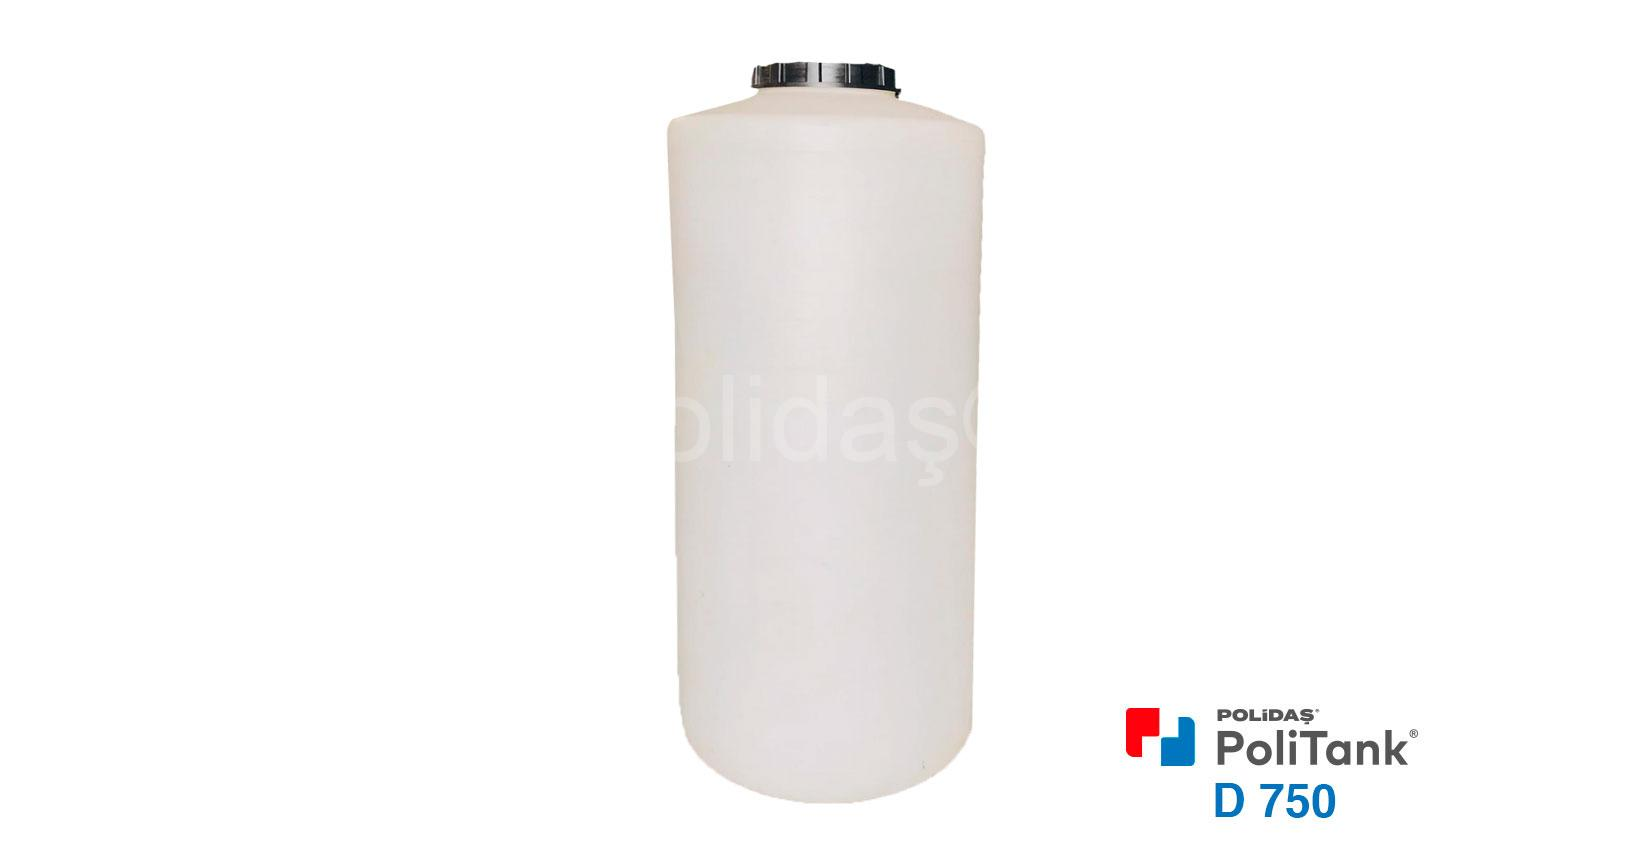 polietilen-dikey-su-tanki-d750